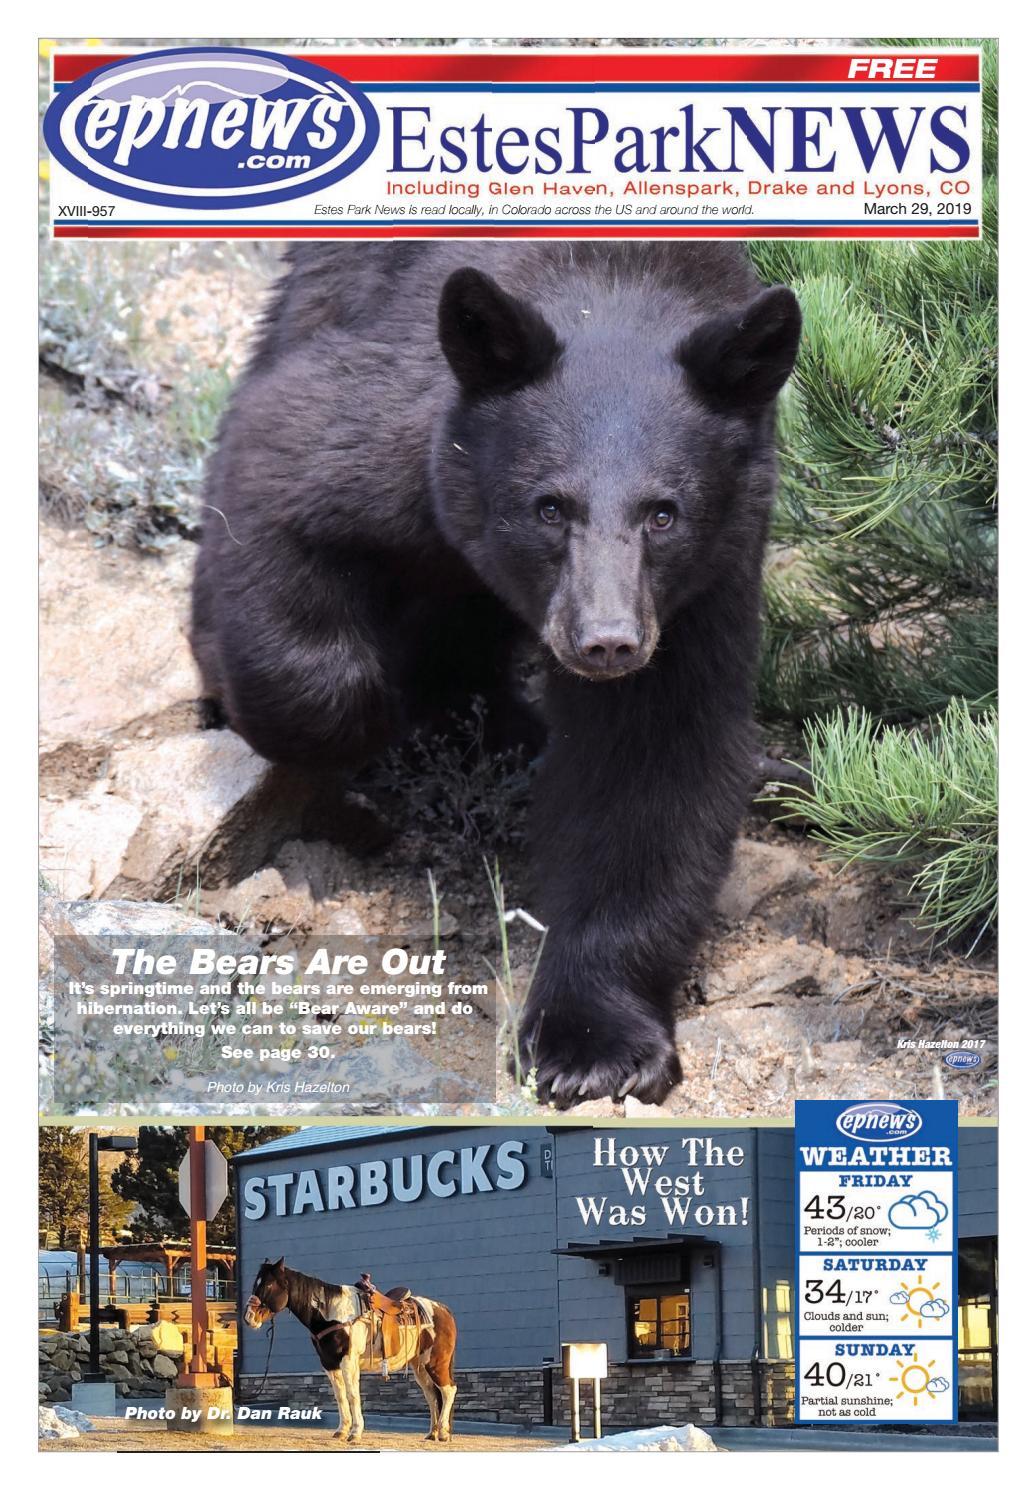 Estes Park News, March 29, 2019 by Estes Park News, Inc - issuu